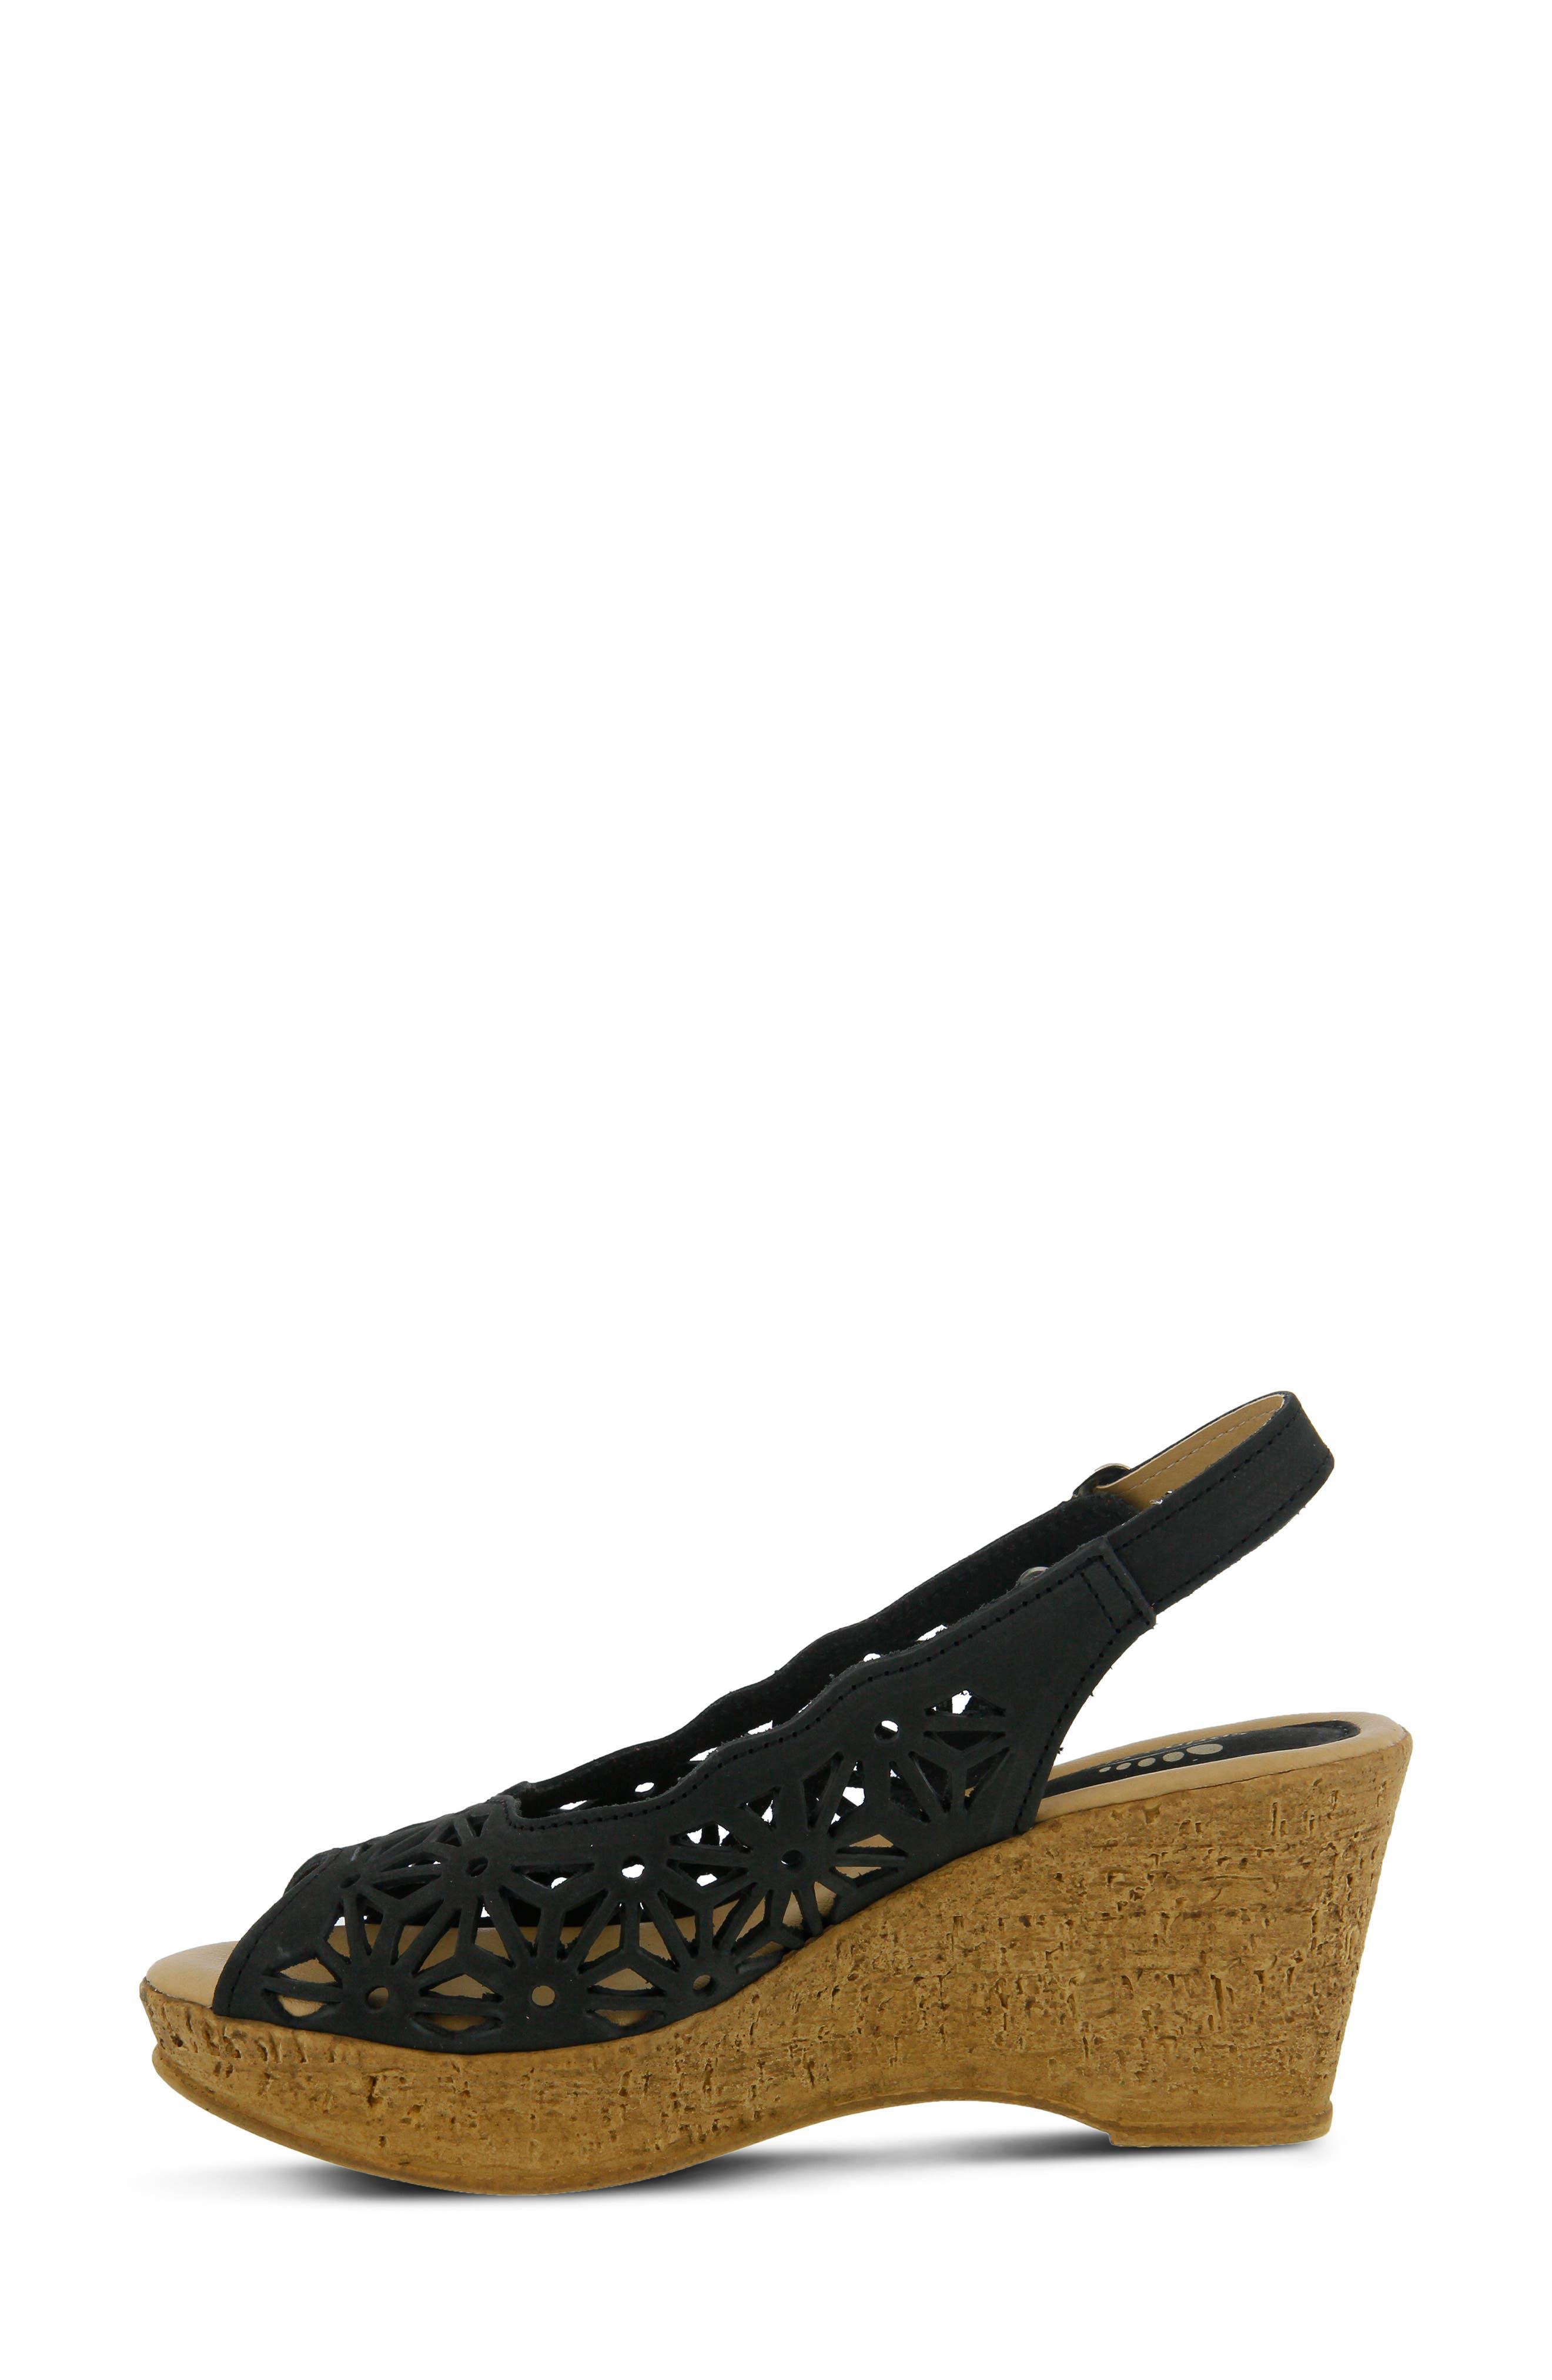 SPRING STEP,                             Abigail Platform Wedge Sandal,                             Alternate thumbnail 6, color,                             BLACK LEATHER